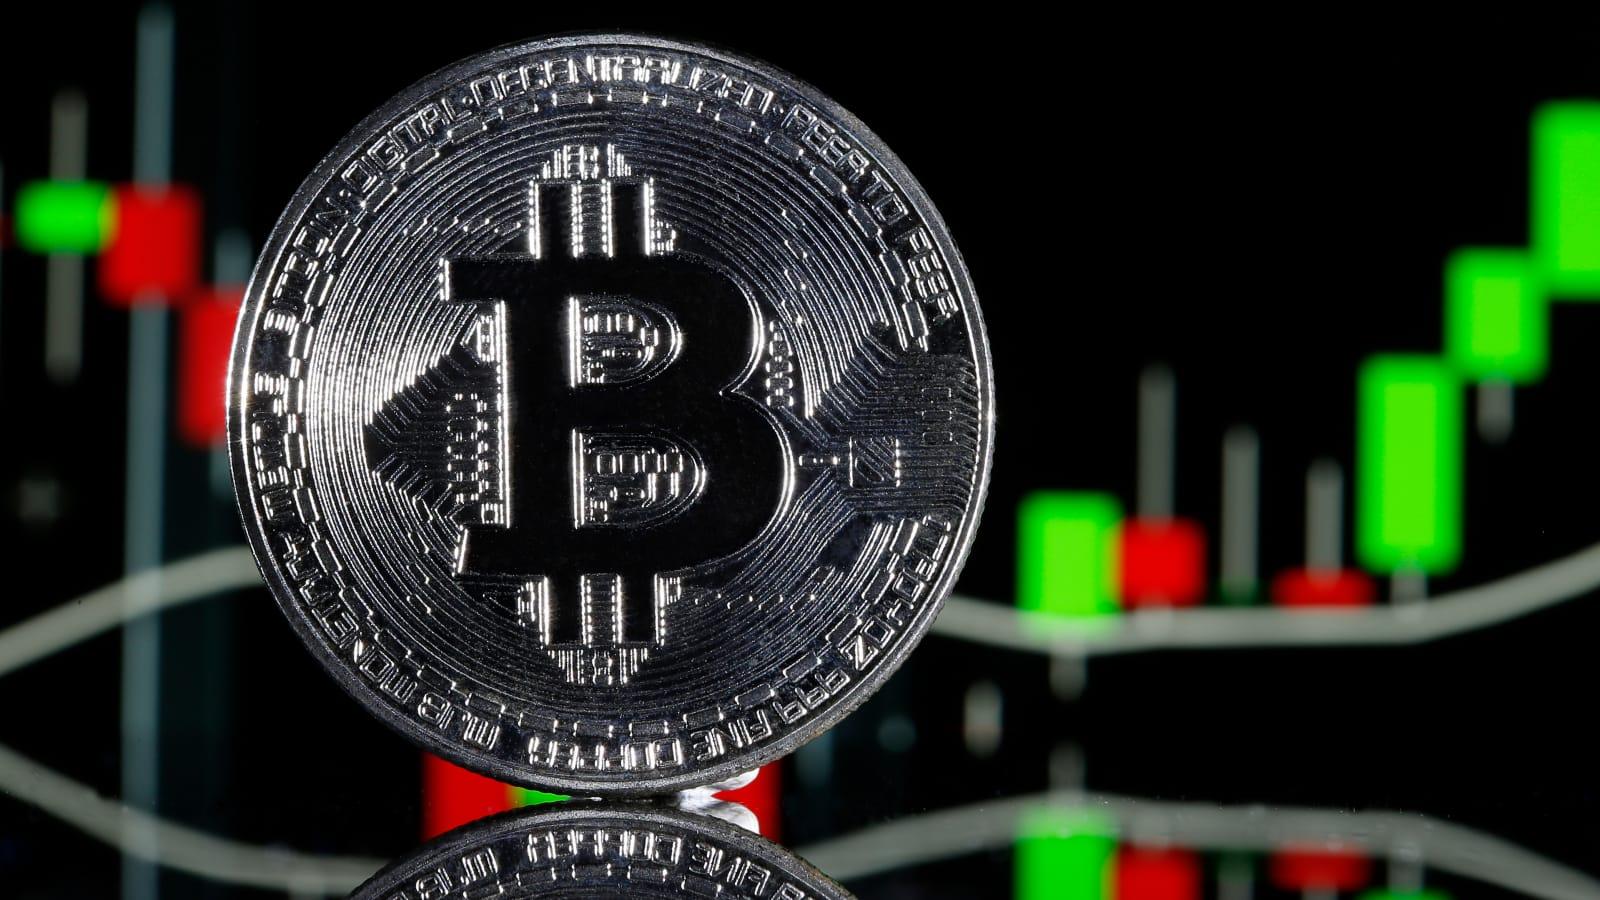 piac bitcoin indonézia